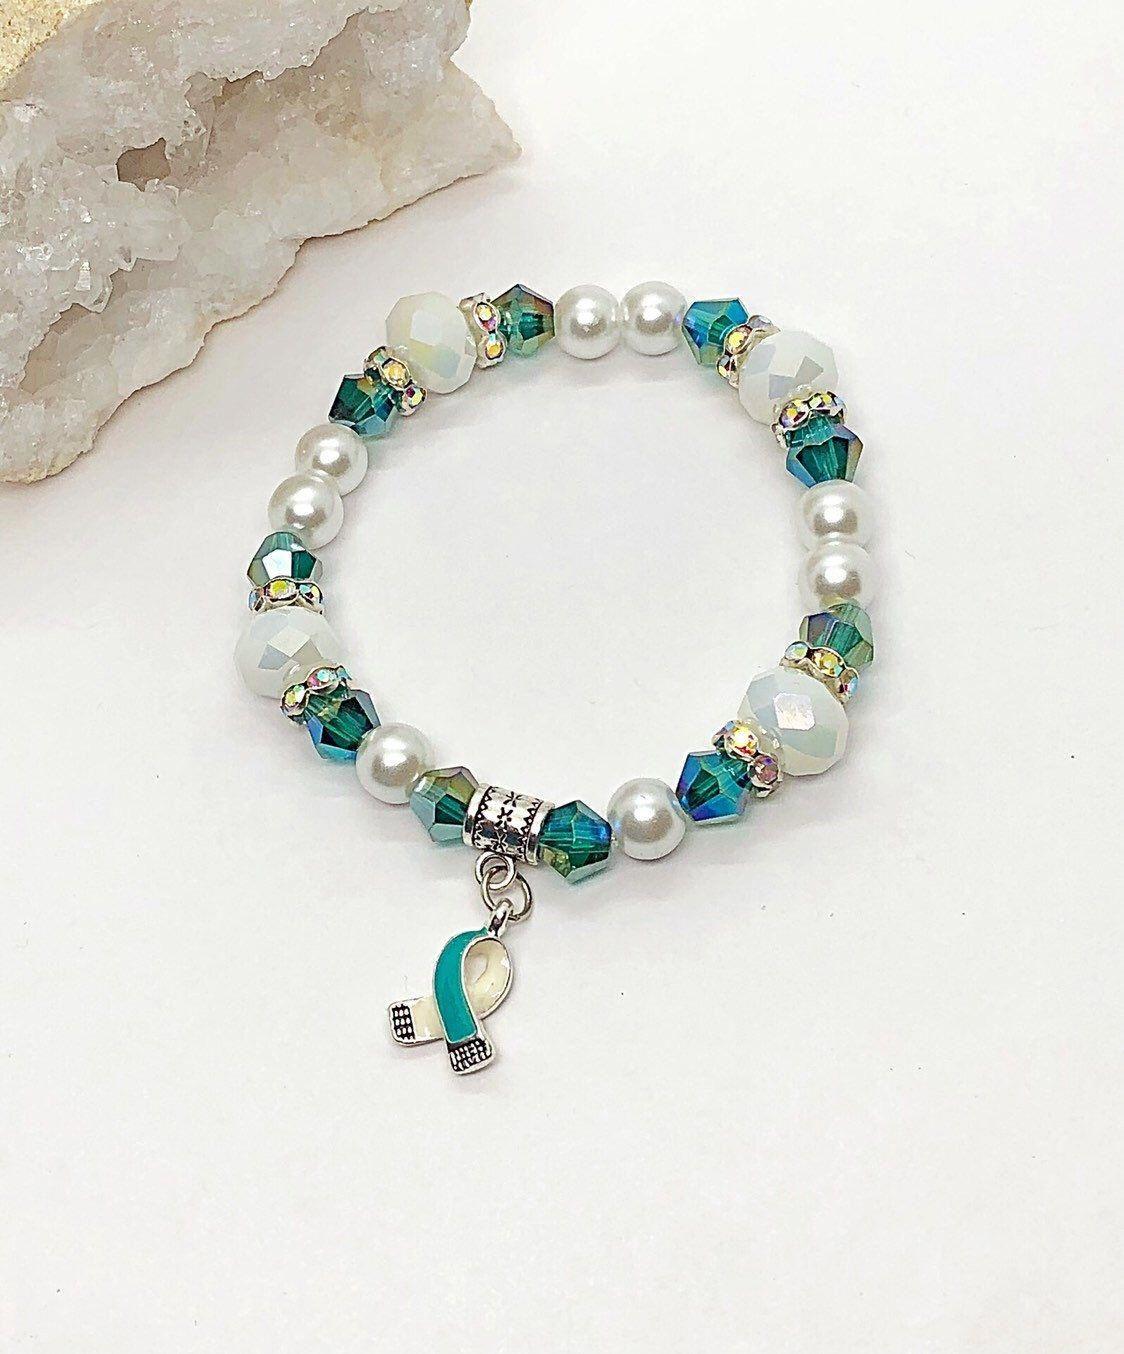 Beaded Jewelry Necklaces Beadedbracelets Beads Bracelet Design Cancer Awareness Bracelet Beaded Bracelets